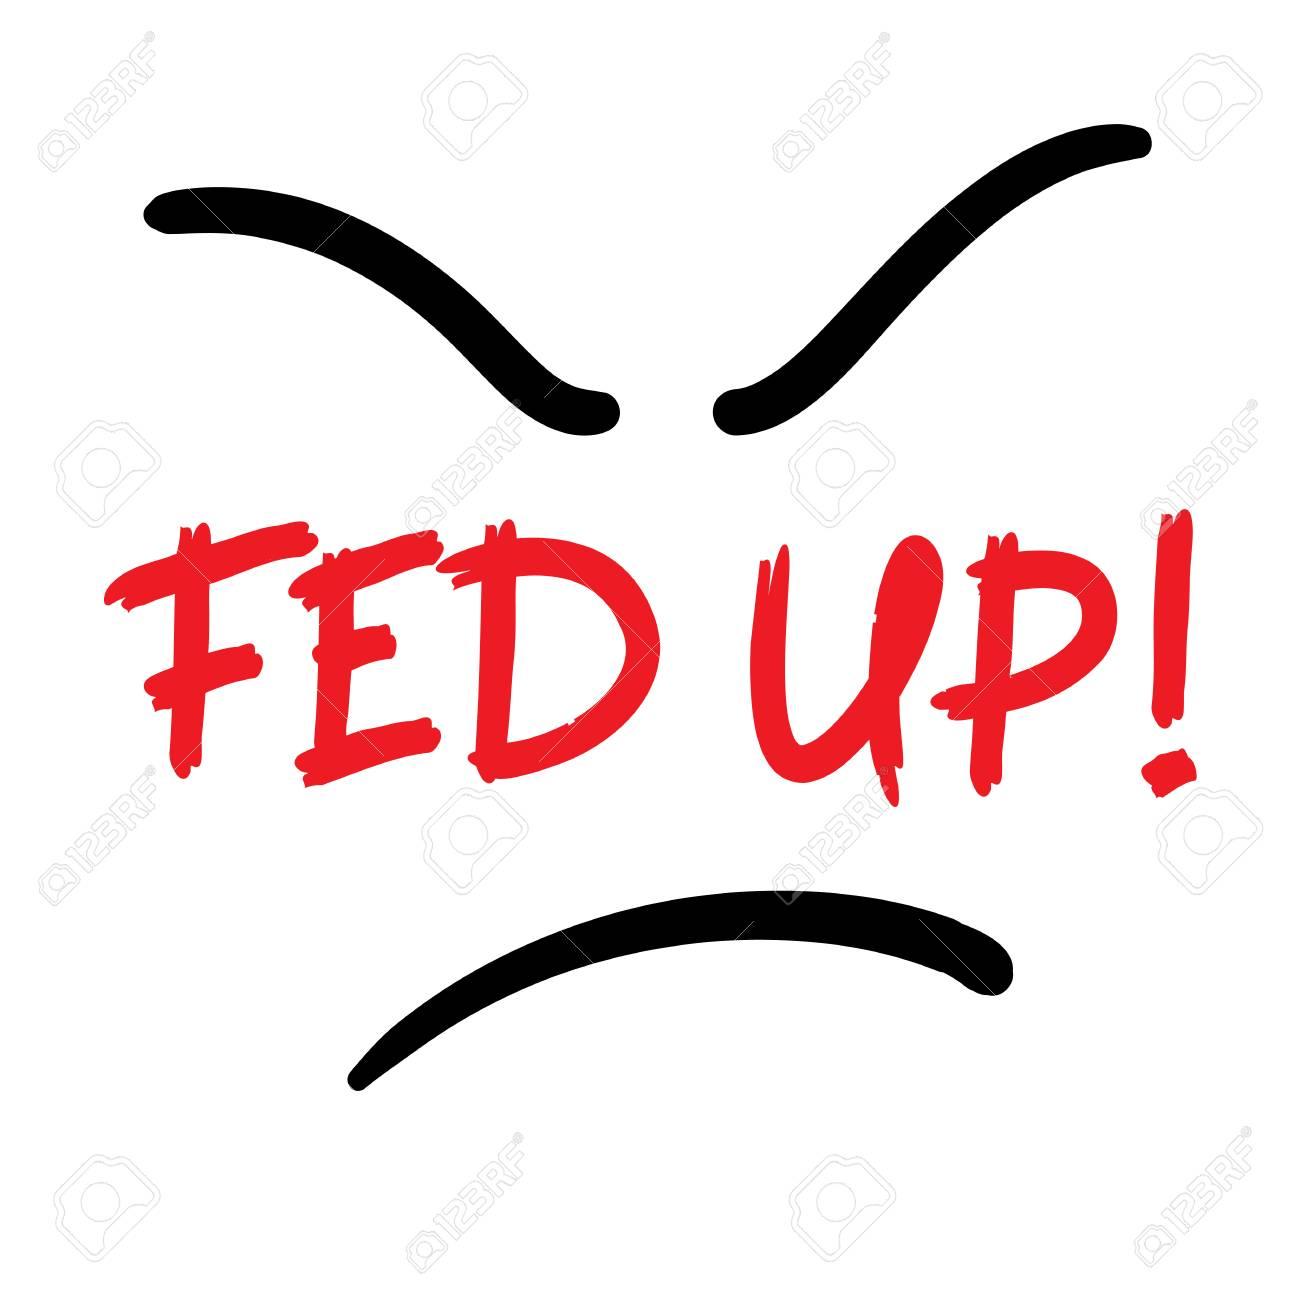 fed up emotional handwritten quote american slang urban rh 123rf com fed up synonym fed up documentary